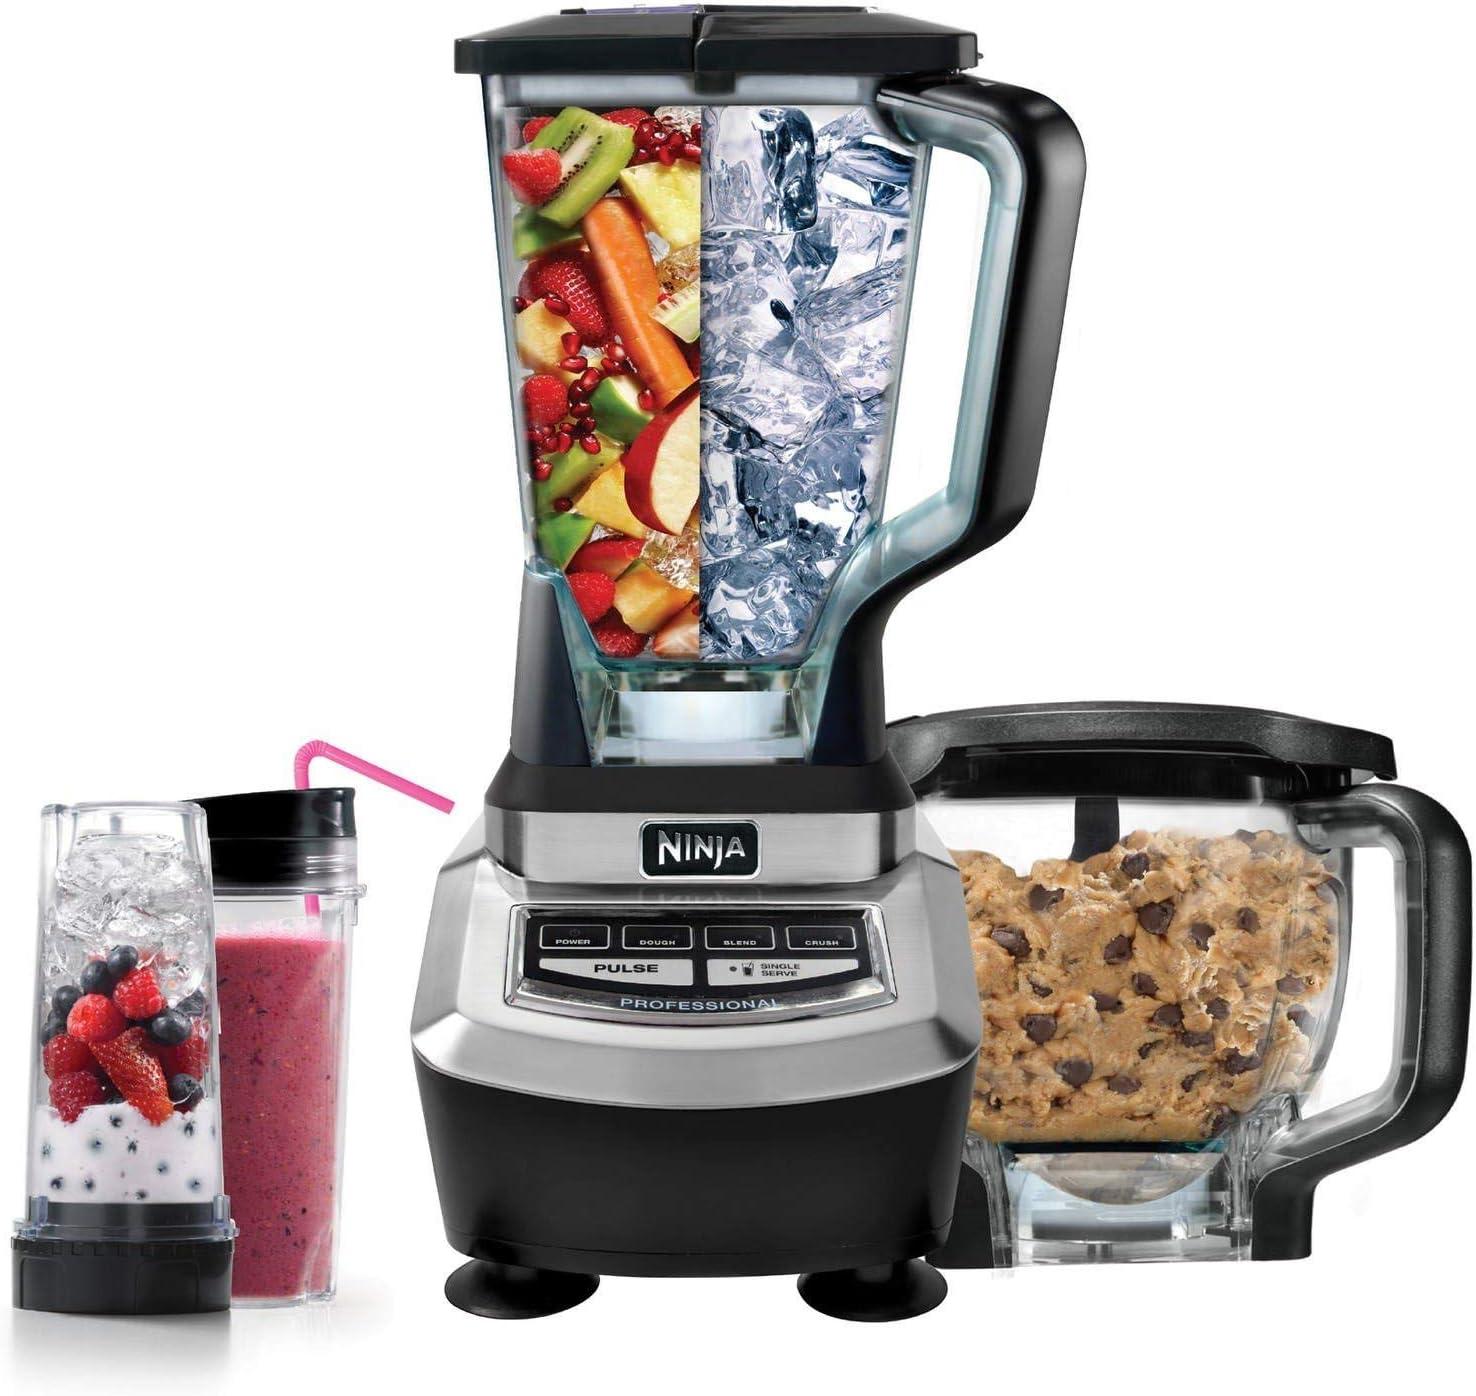 Ninja Supra Kitchen System 1200 watts (Certified Refurbished)